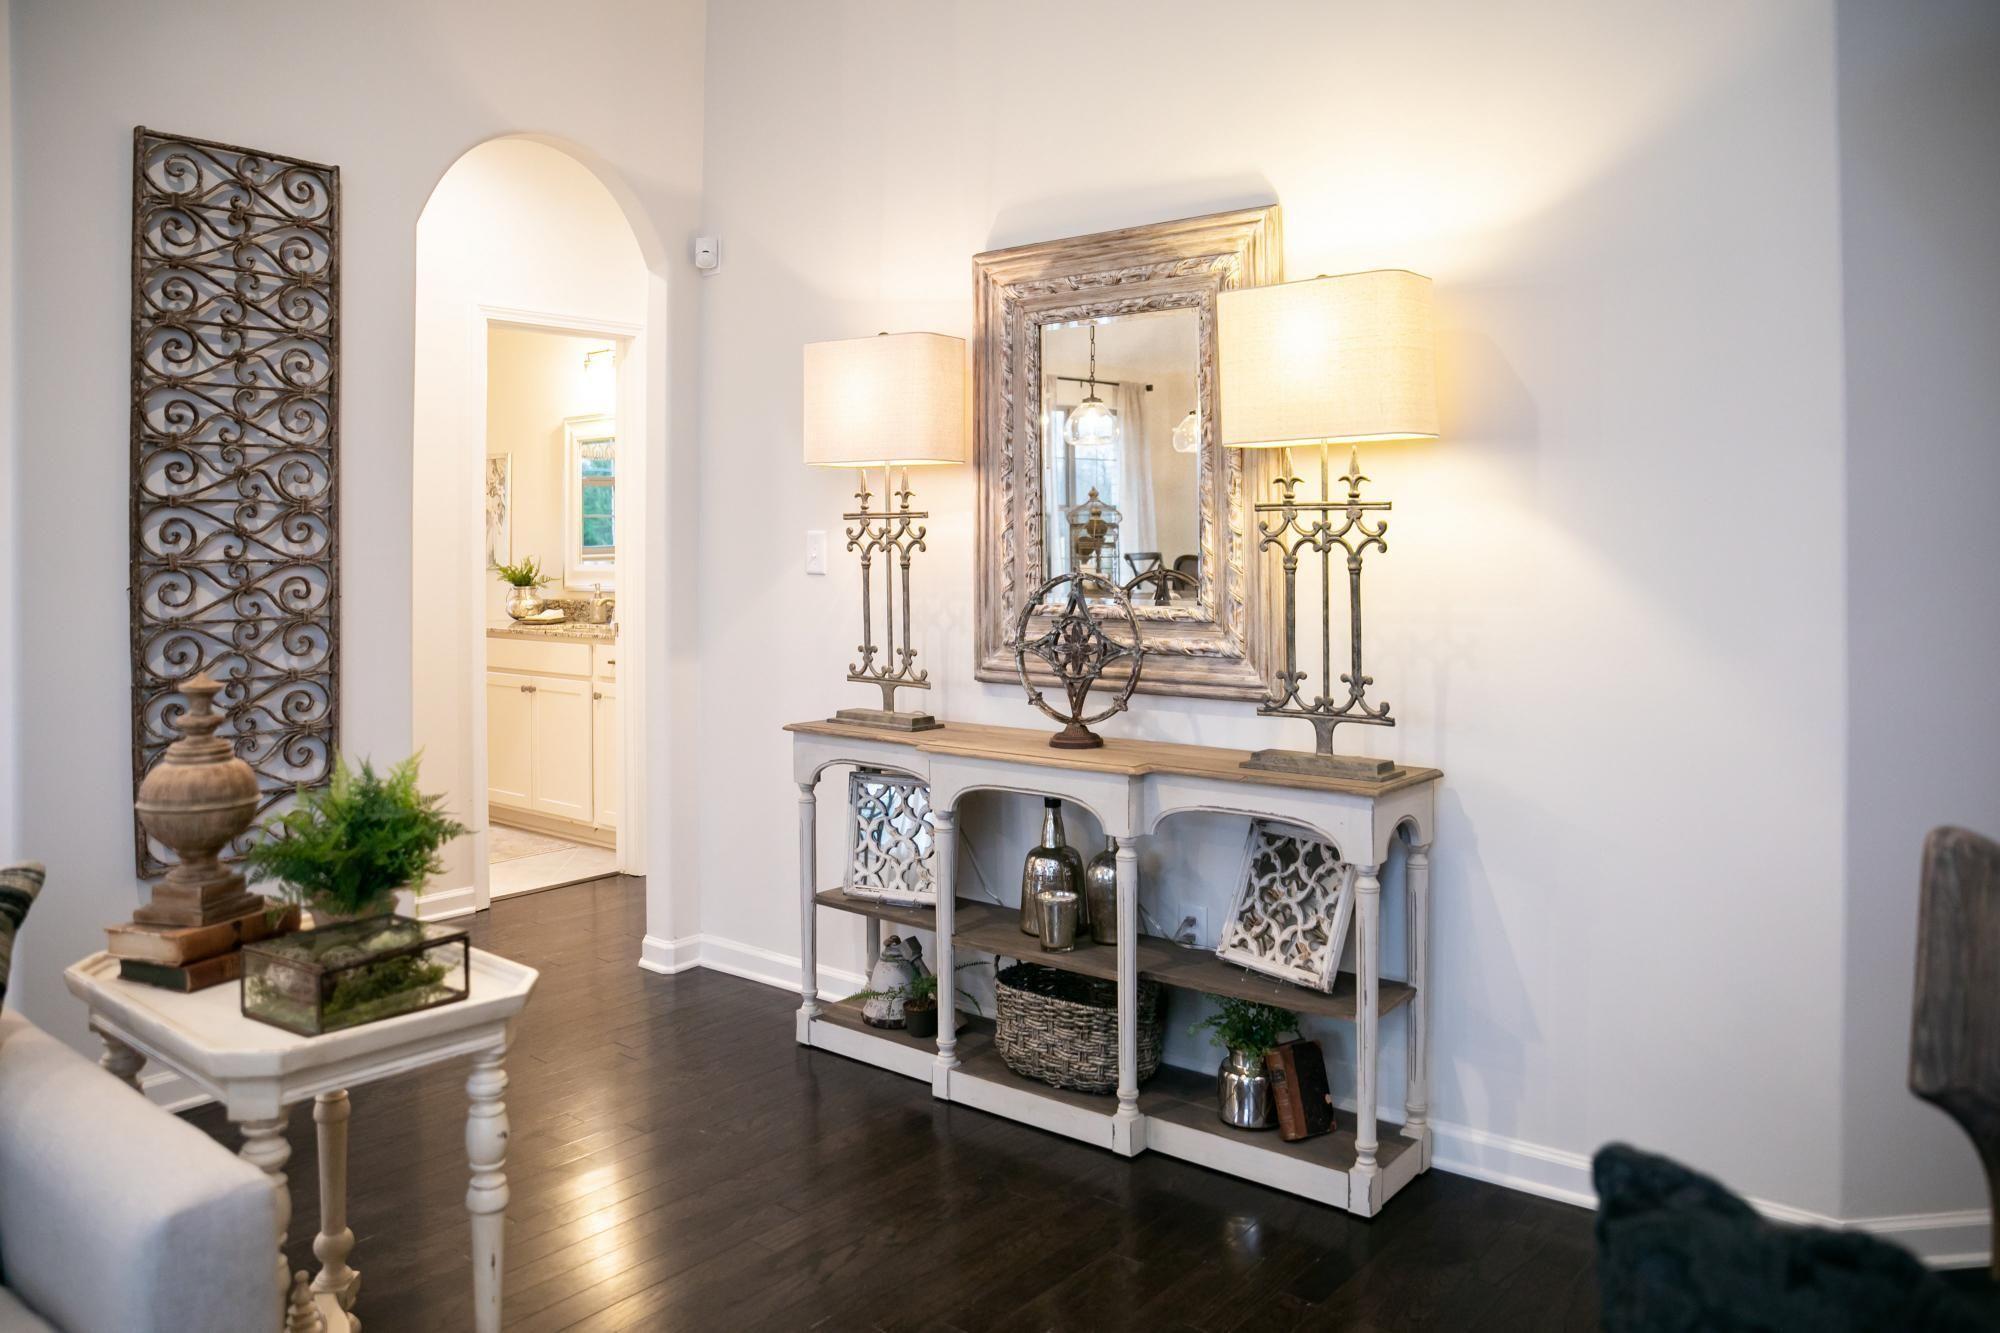 Living Area featured in the Presley II By Regency Homebuilders in Memphis, TN